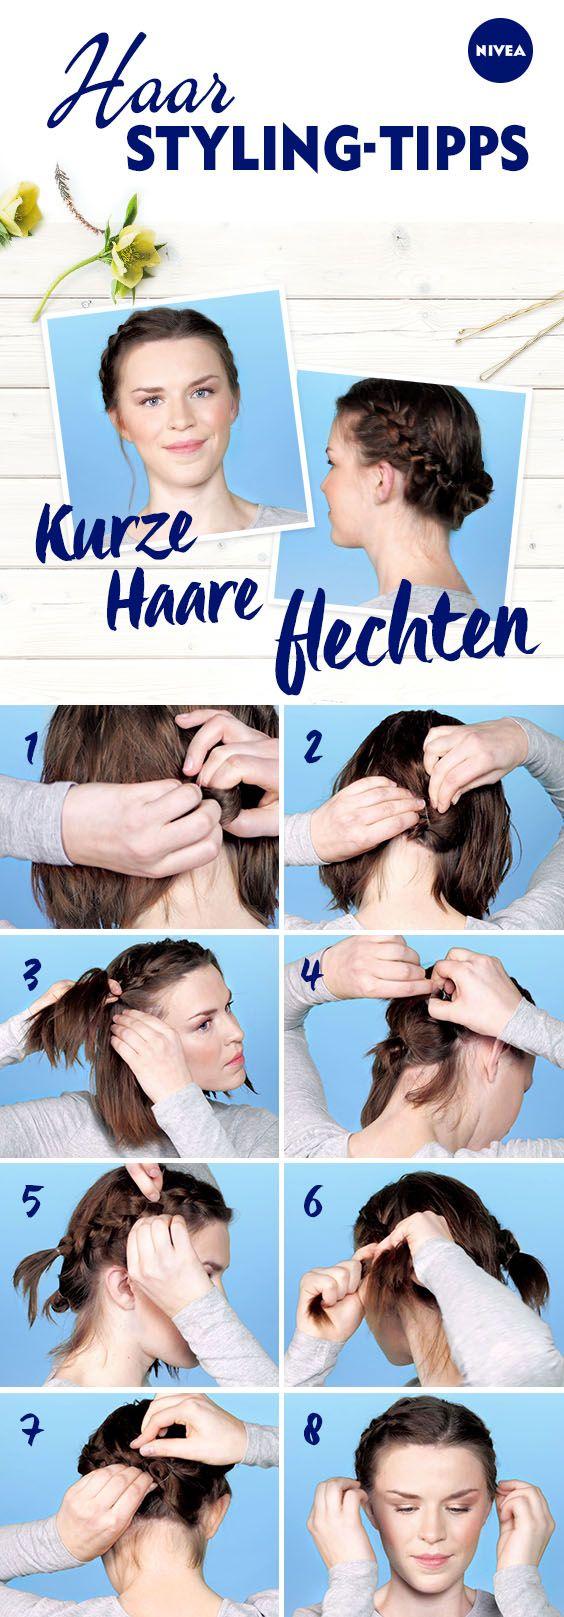 Styling tipps schulterlange haare